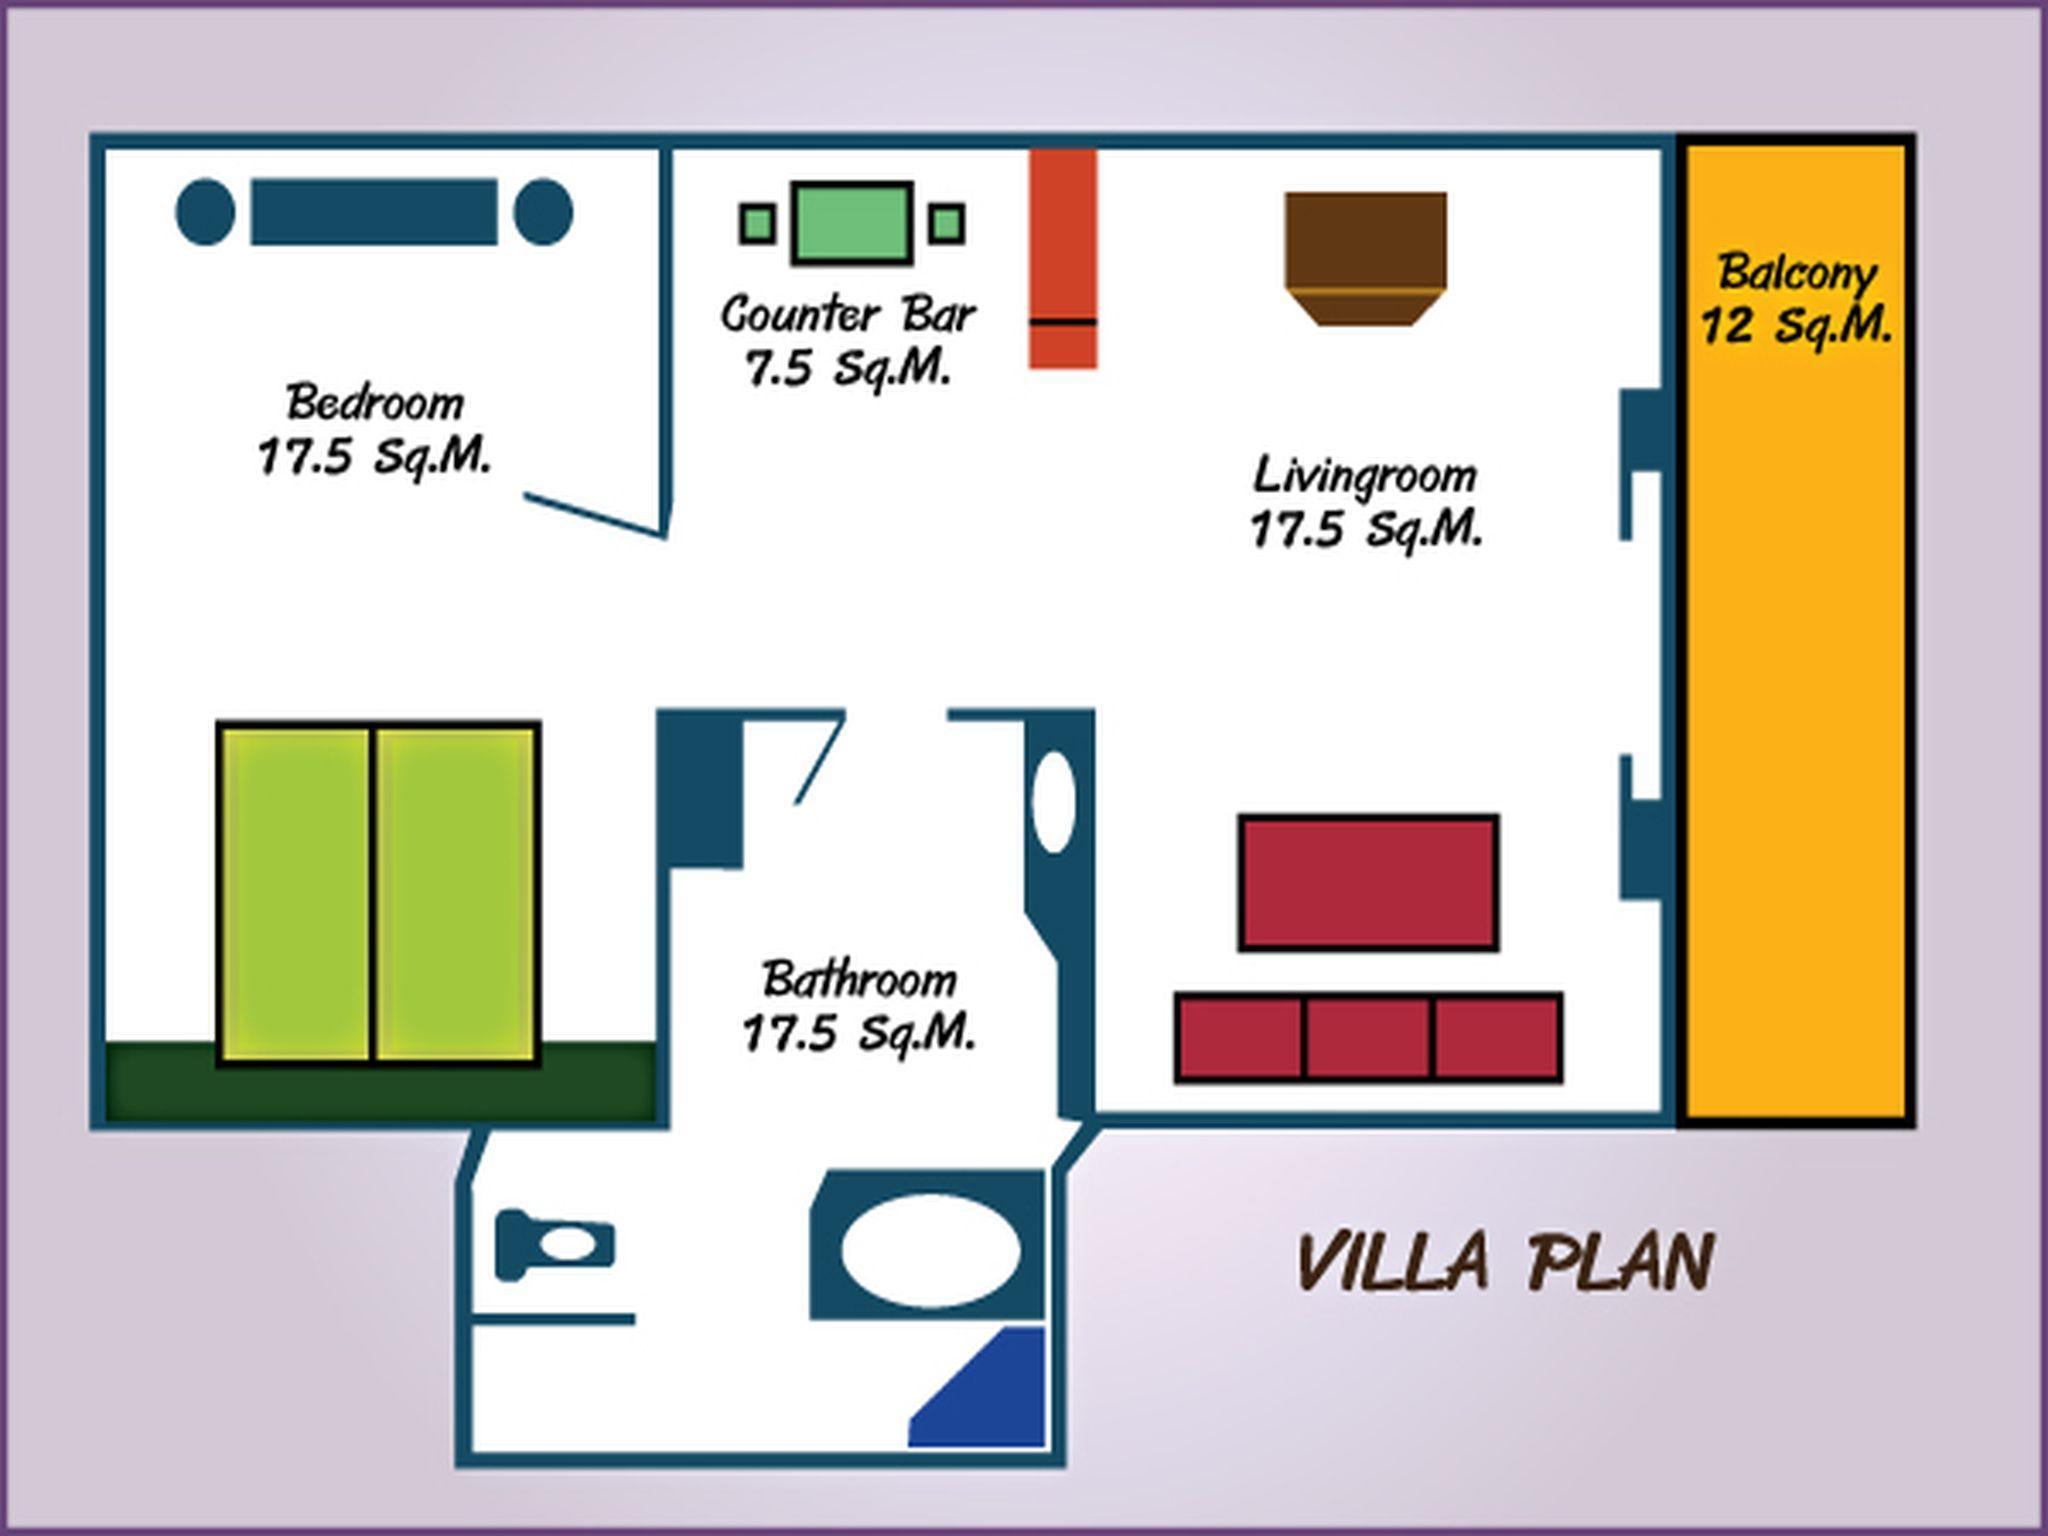 Holiday Villa Hotel โรงแรมฮอลิเดย์ วิลลา